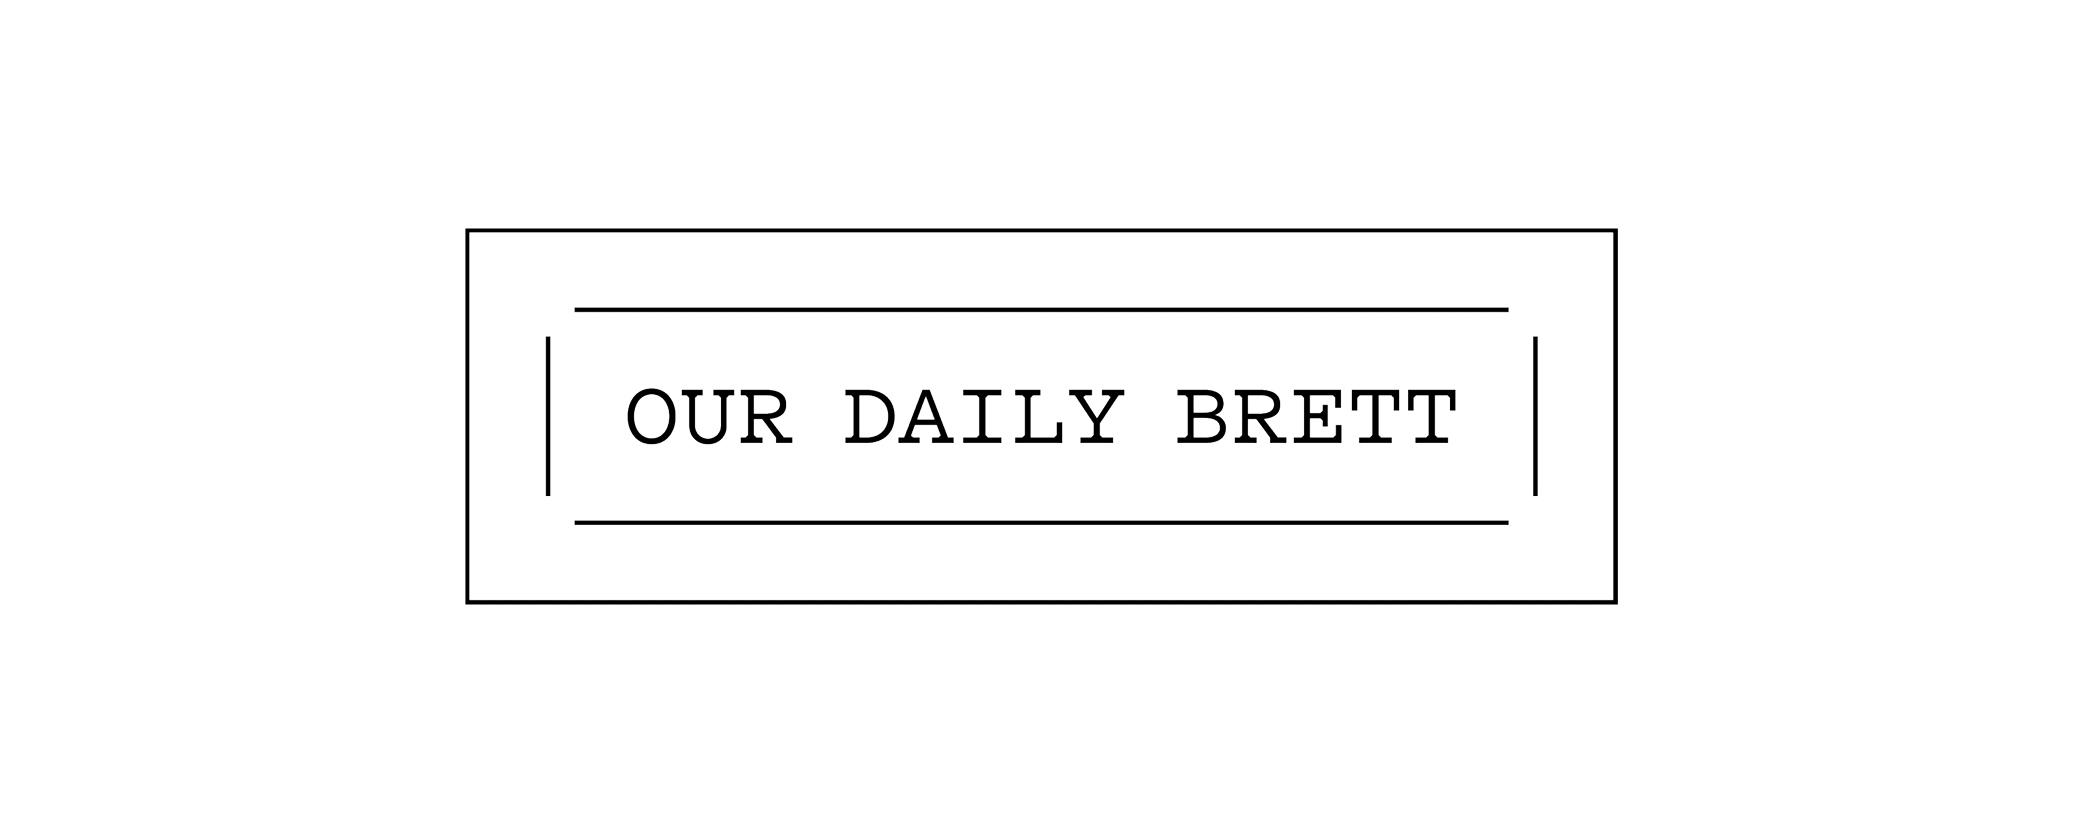 our daily brett.jpg